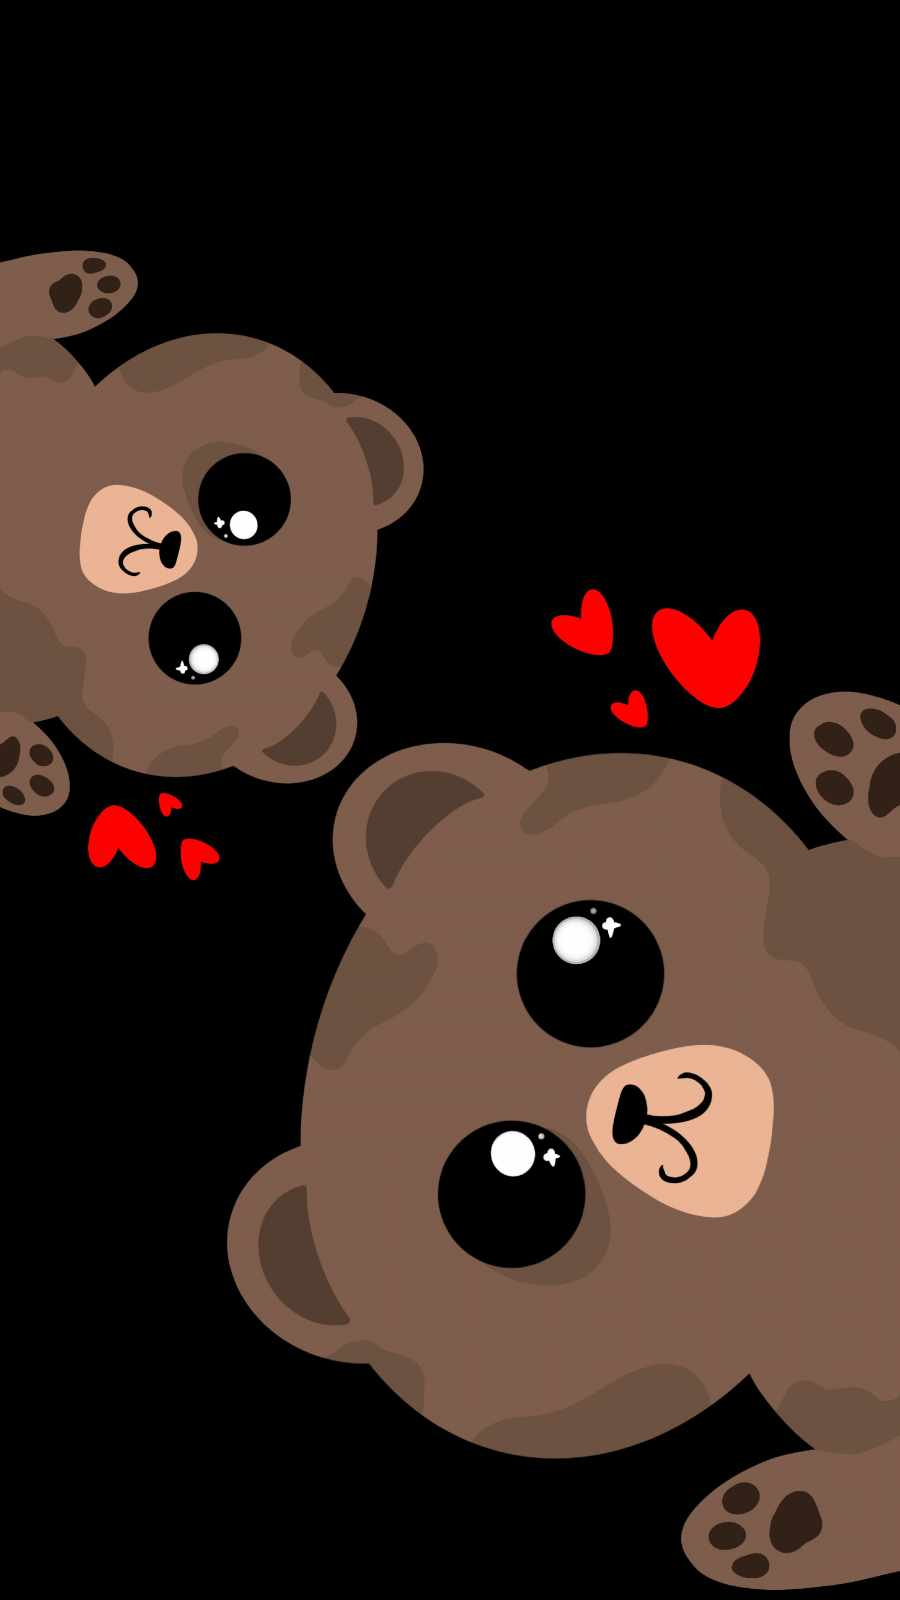 Cute Teddy iPhone Wallpaper